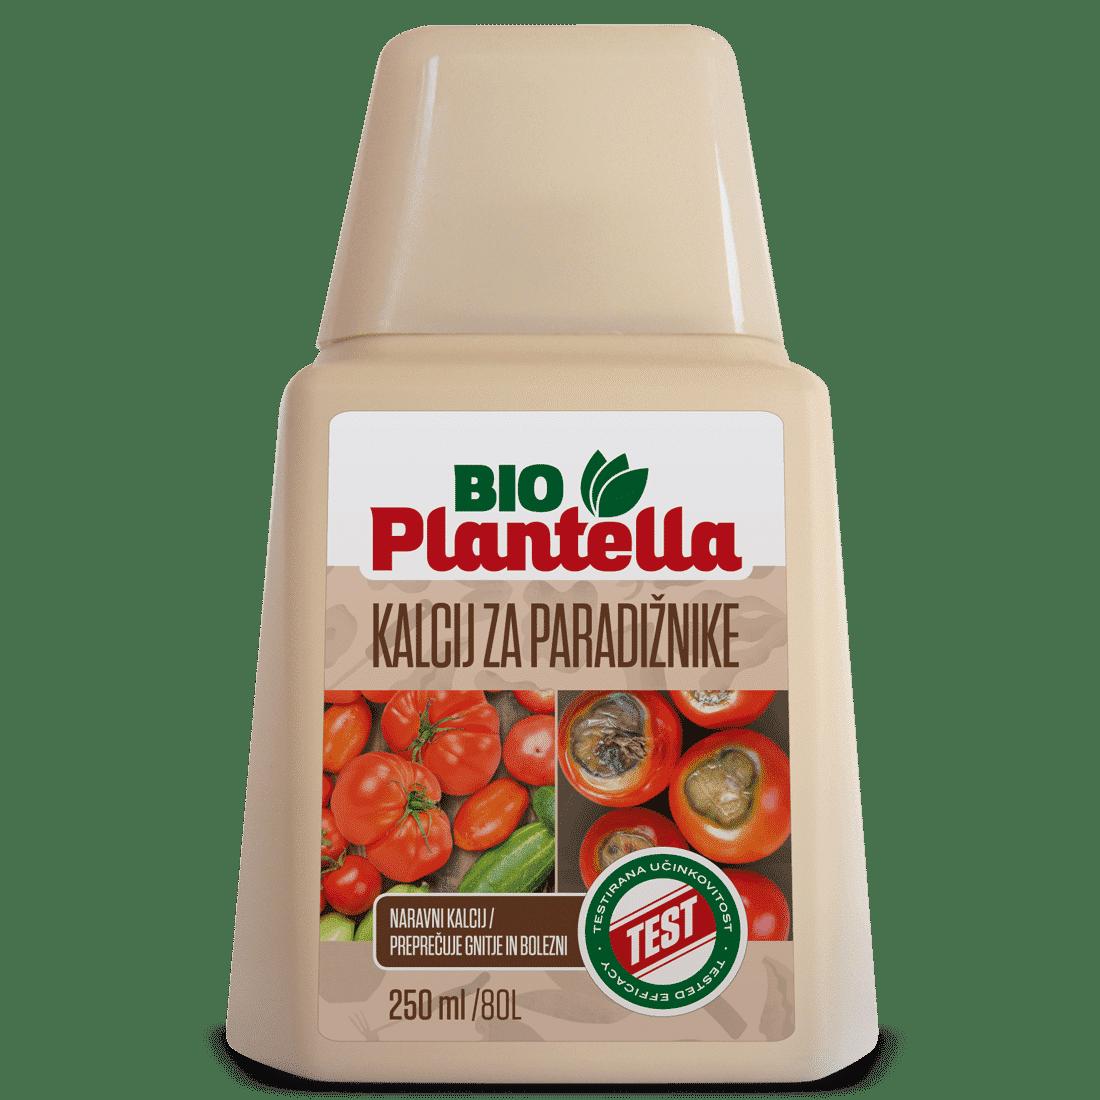 Bio-Plantella_Kalcij-paradiznike_250ml_SI